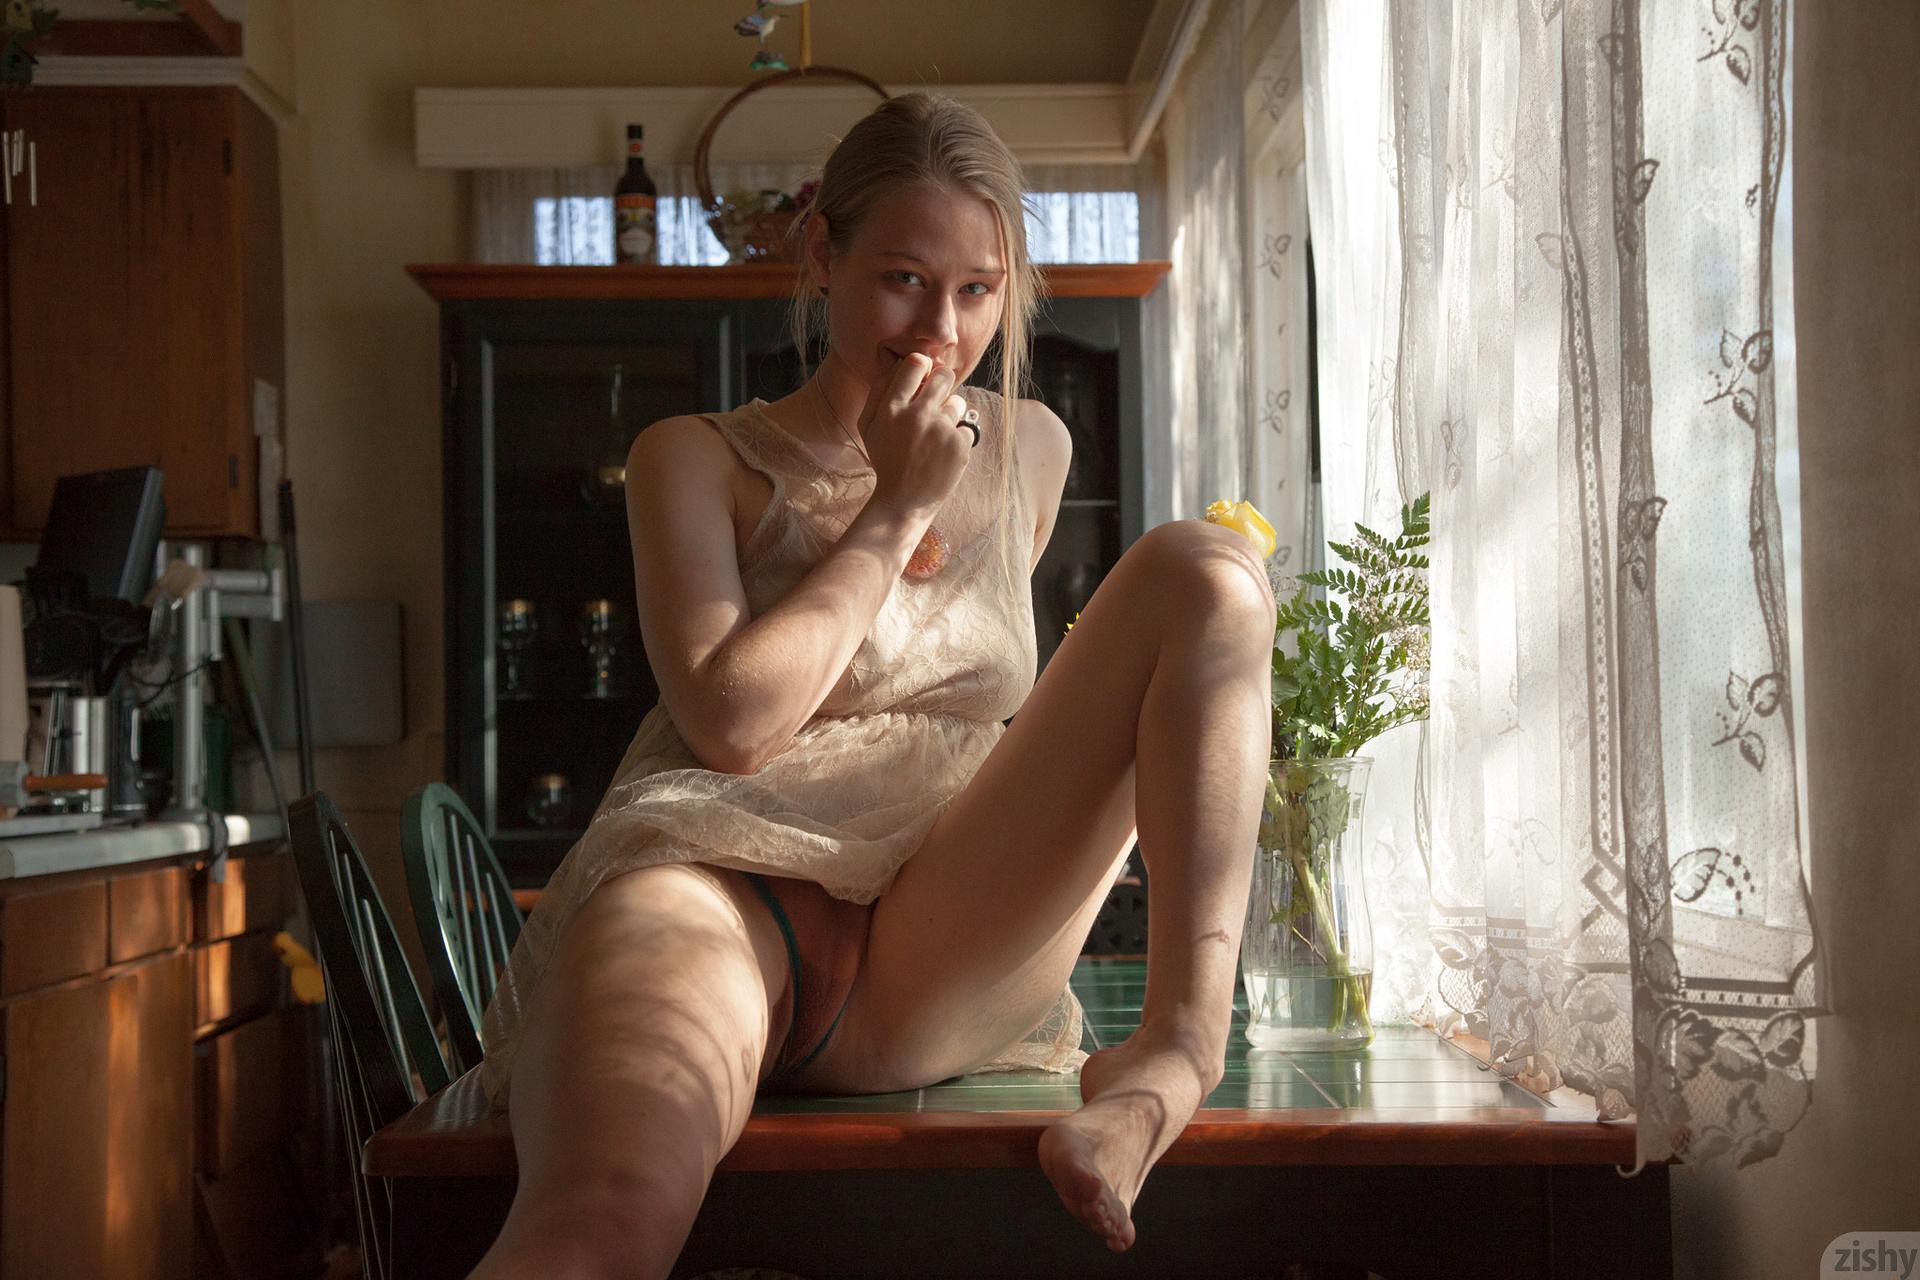 Zishy - Gloria Paquette Just A Dab 81